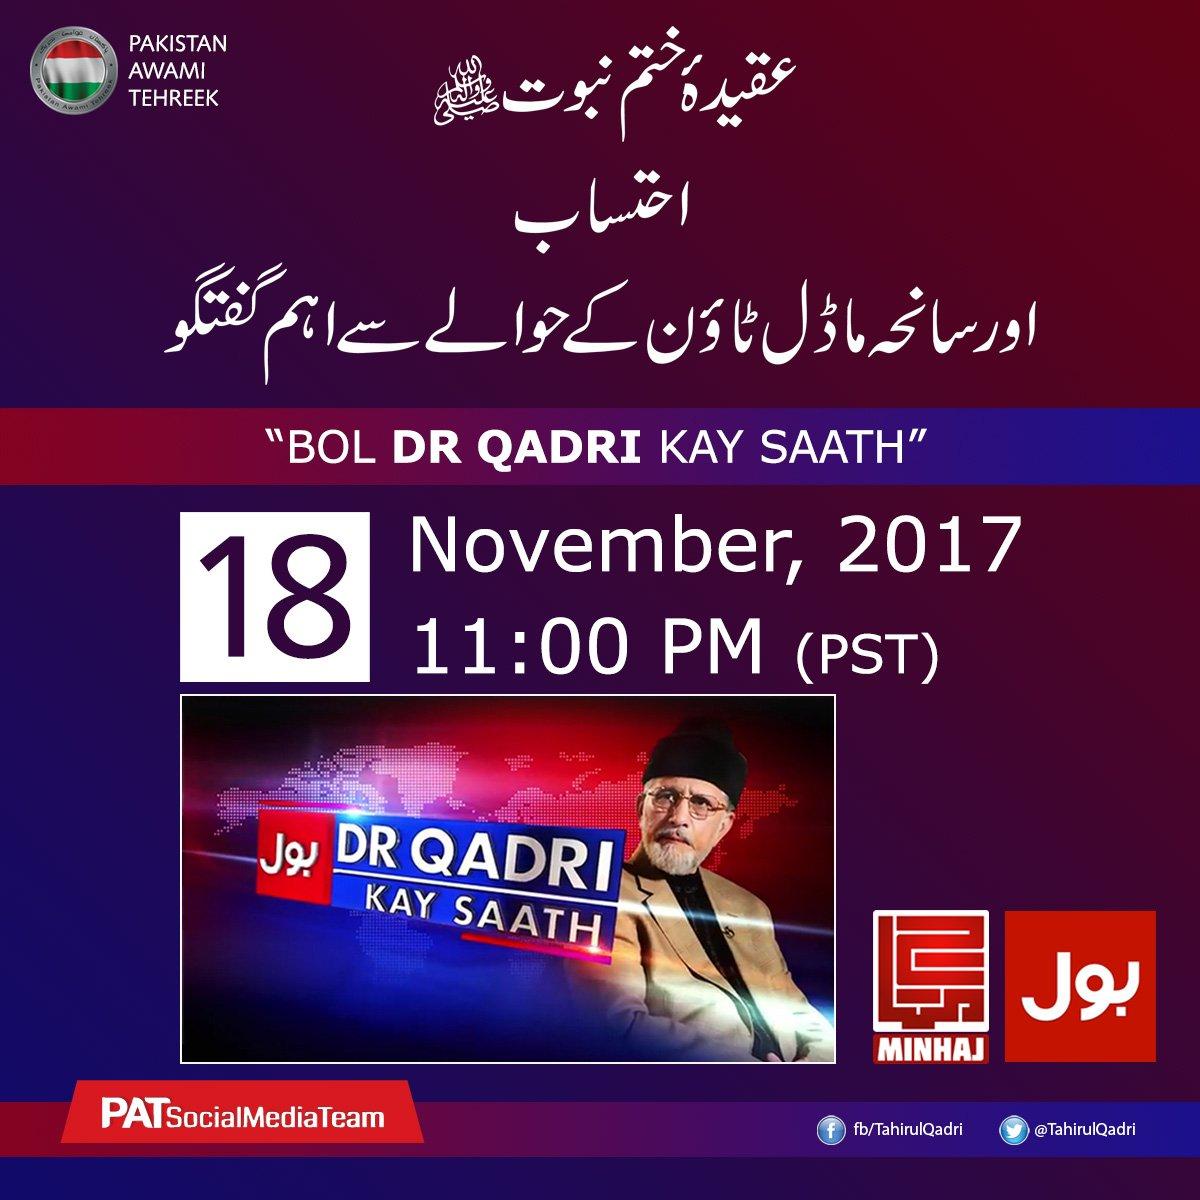 Watch Dr Tahir-ul-Qadri in program 'BOL Dr Qadri Kay Saath' on BOL News | Saturday, 18 November, at 11:00 PM